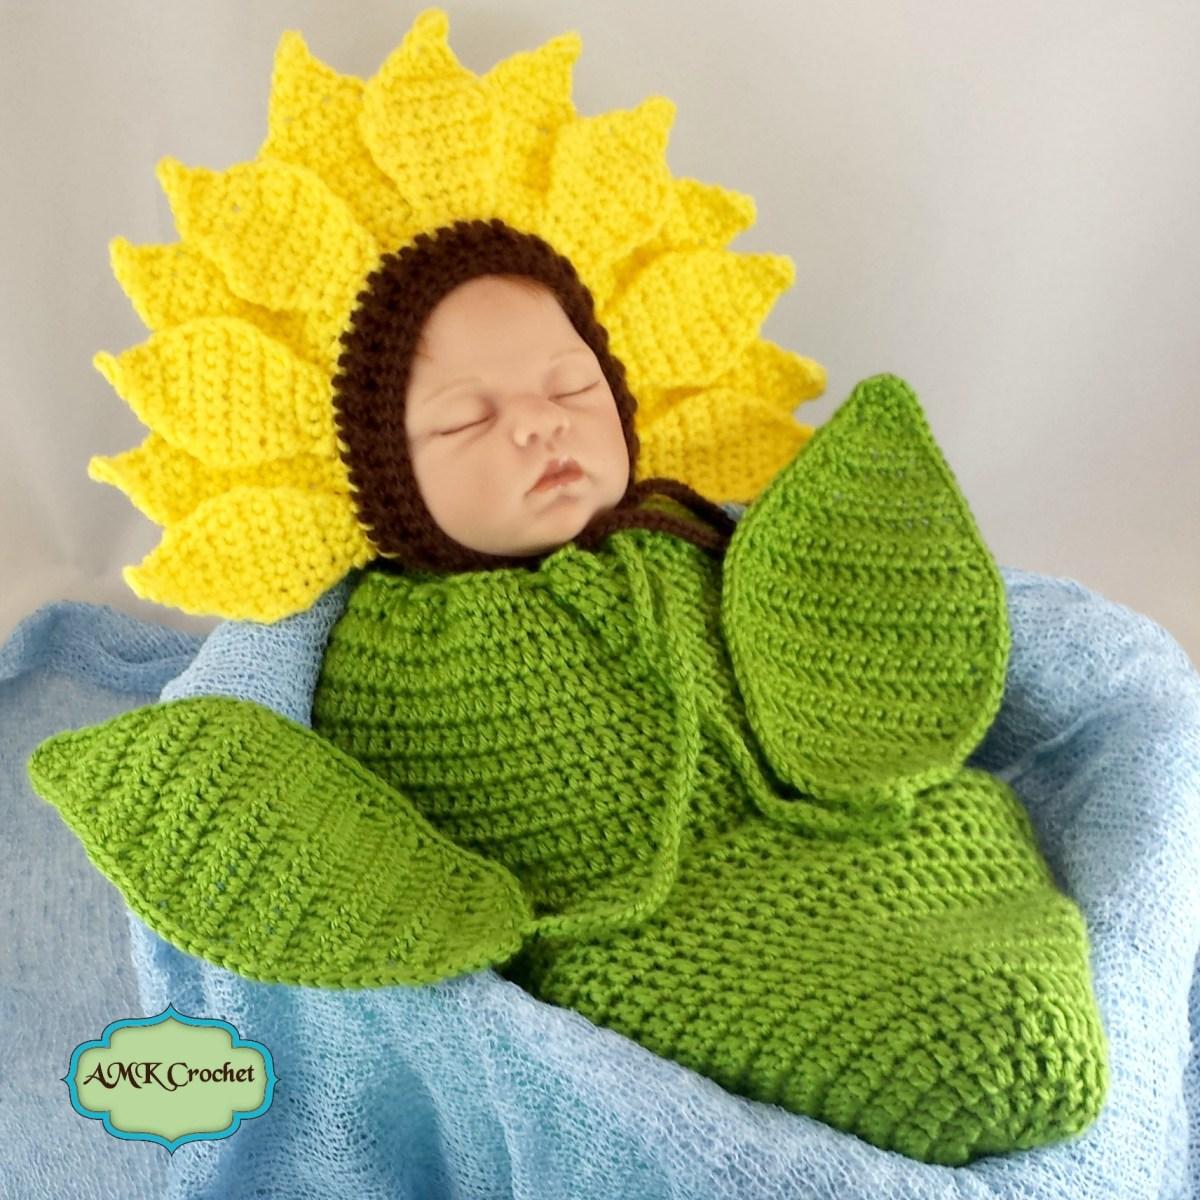 Crochet Newborn Sunflower Photo Prop Pattern